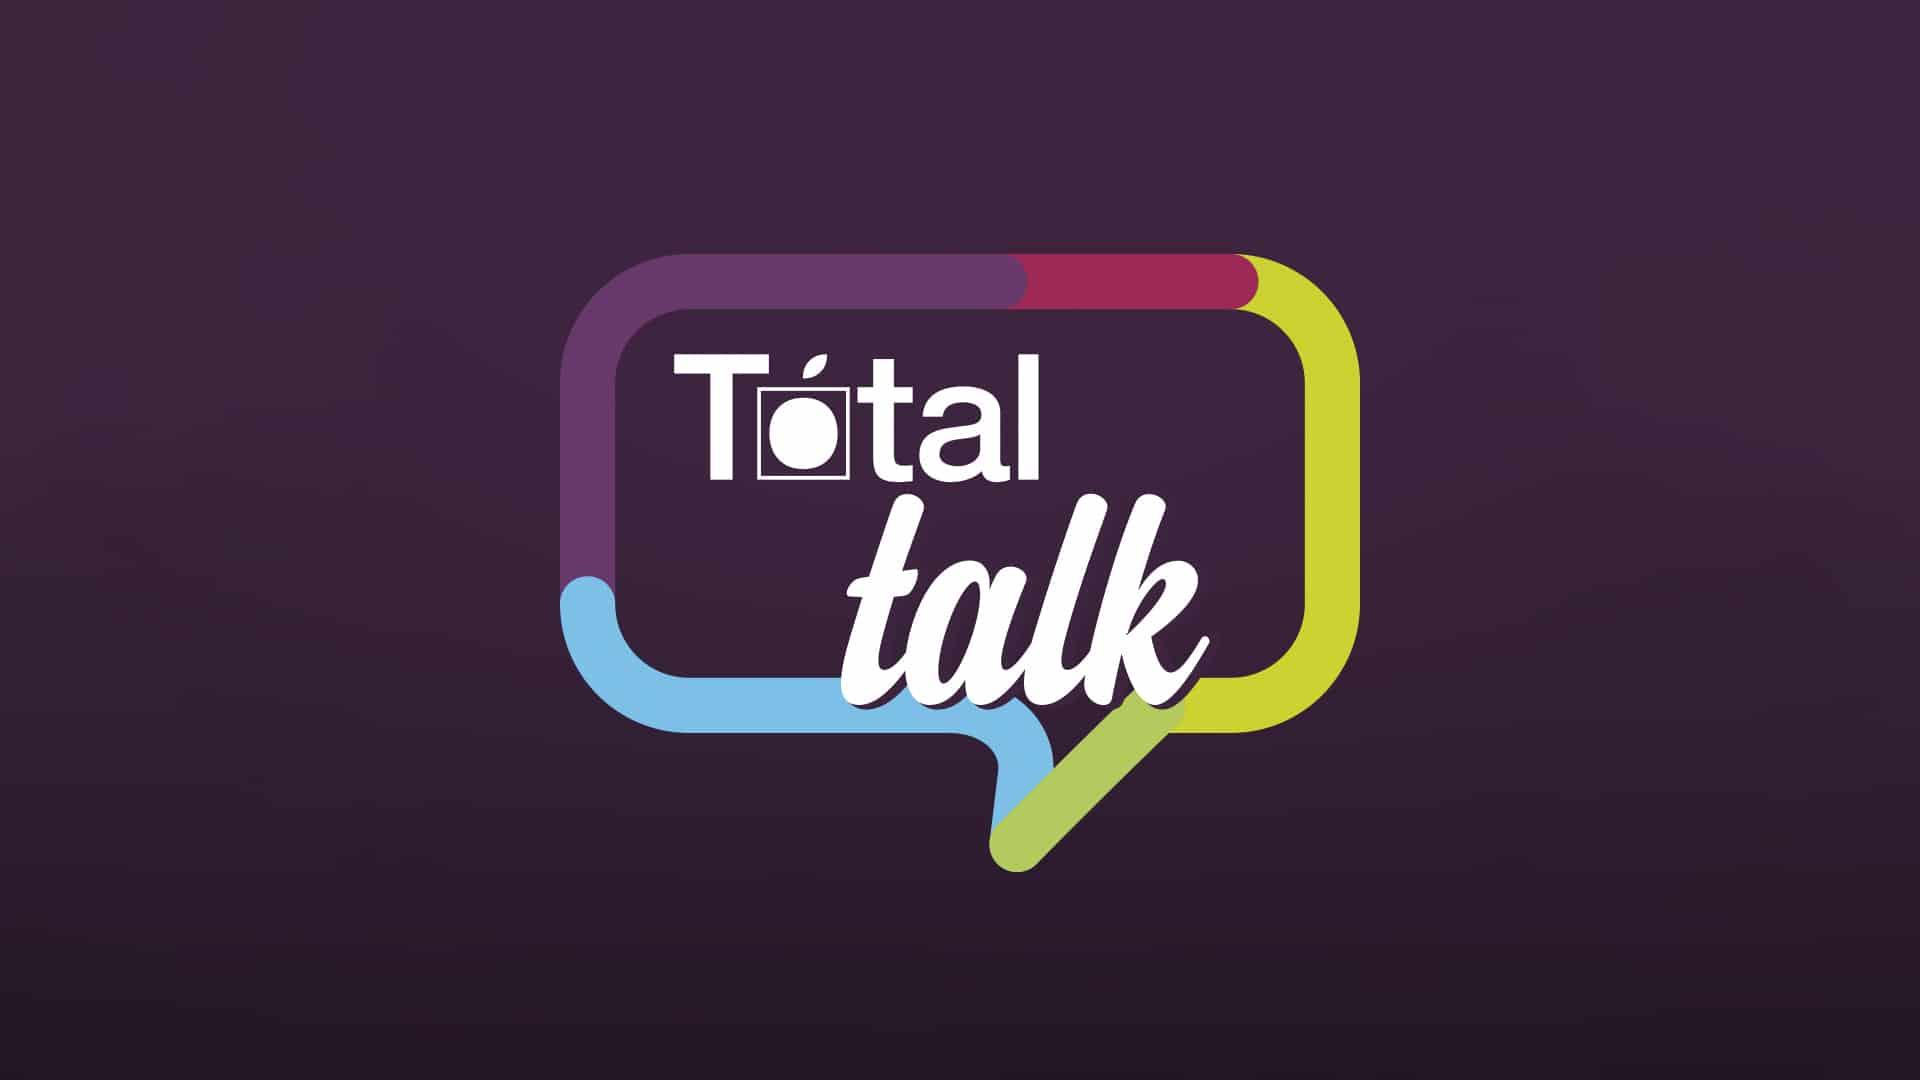 Total Talk-logo-1920x1080px